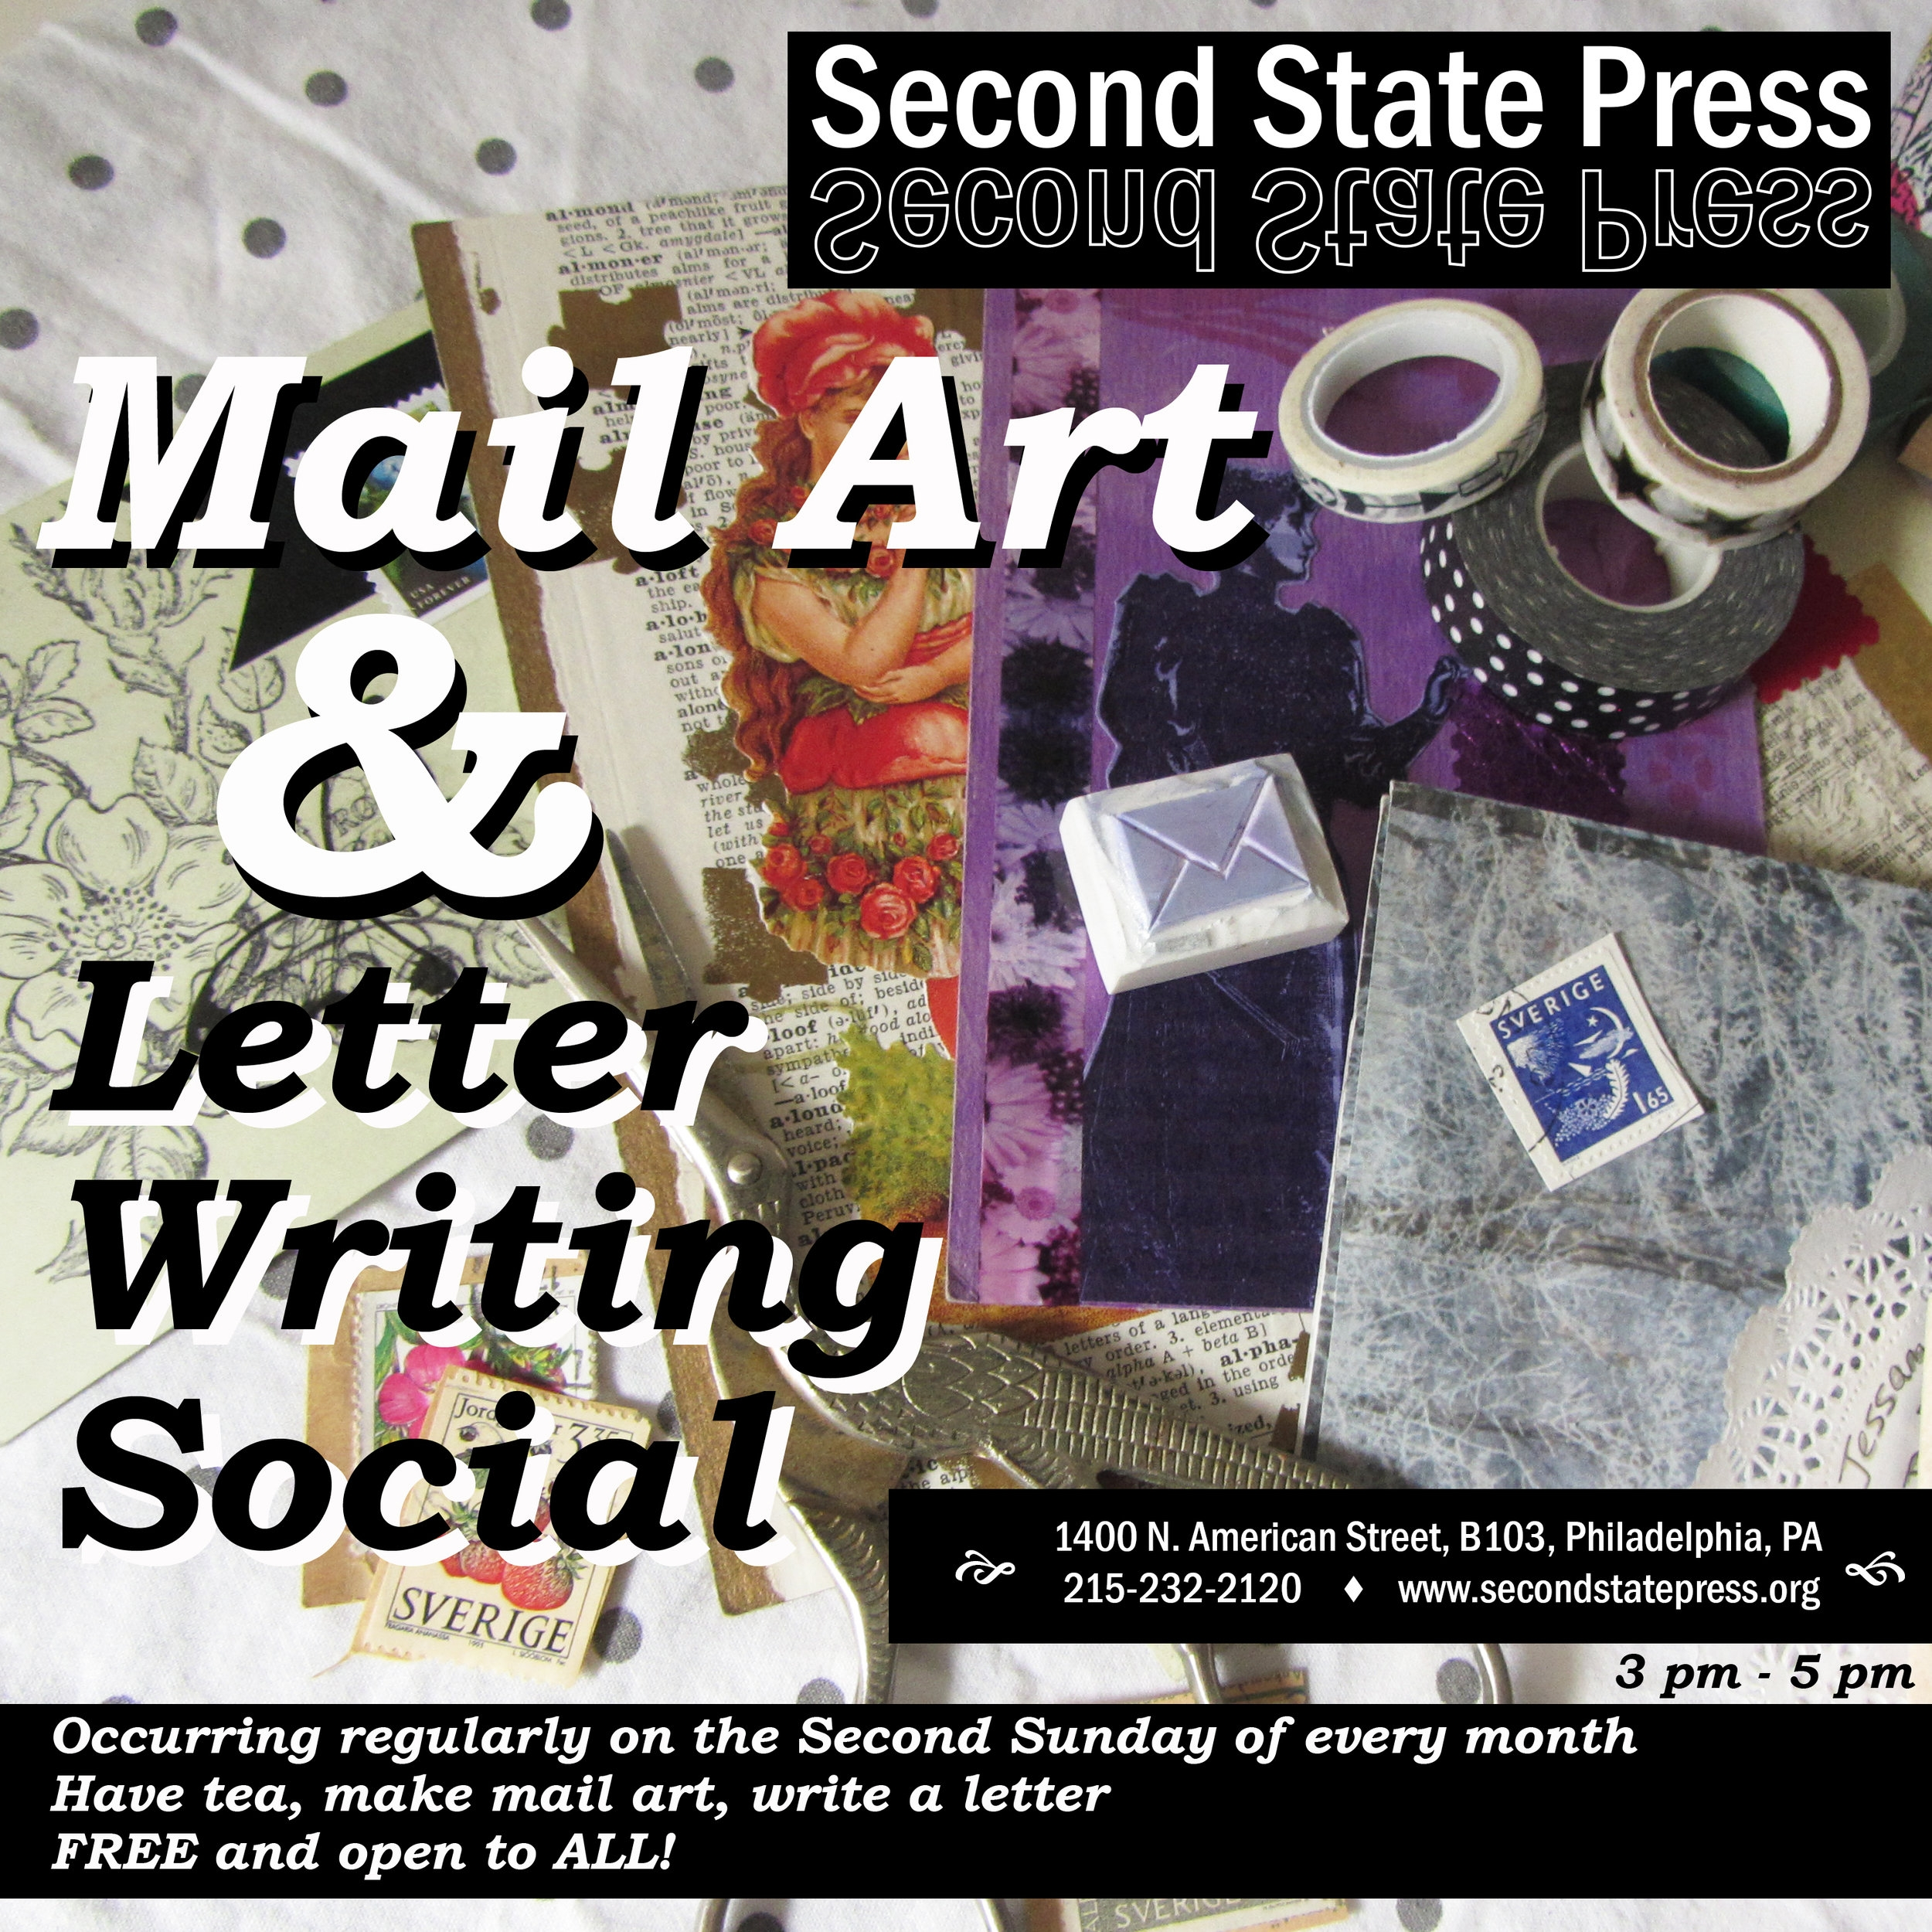 MailArtSocialSquareFlatColor.jpg